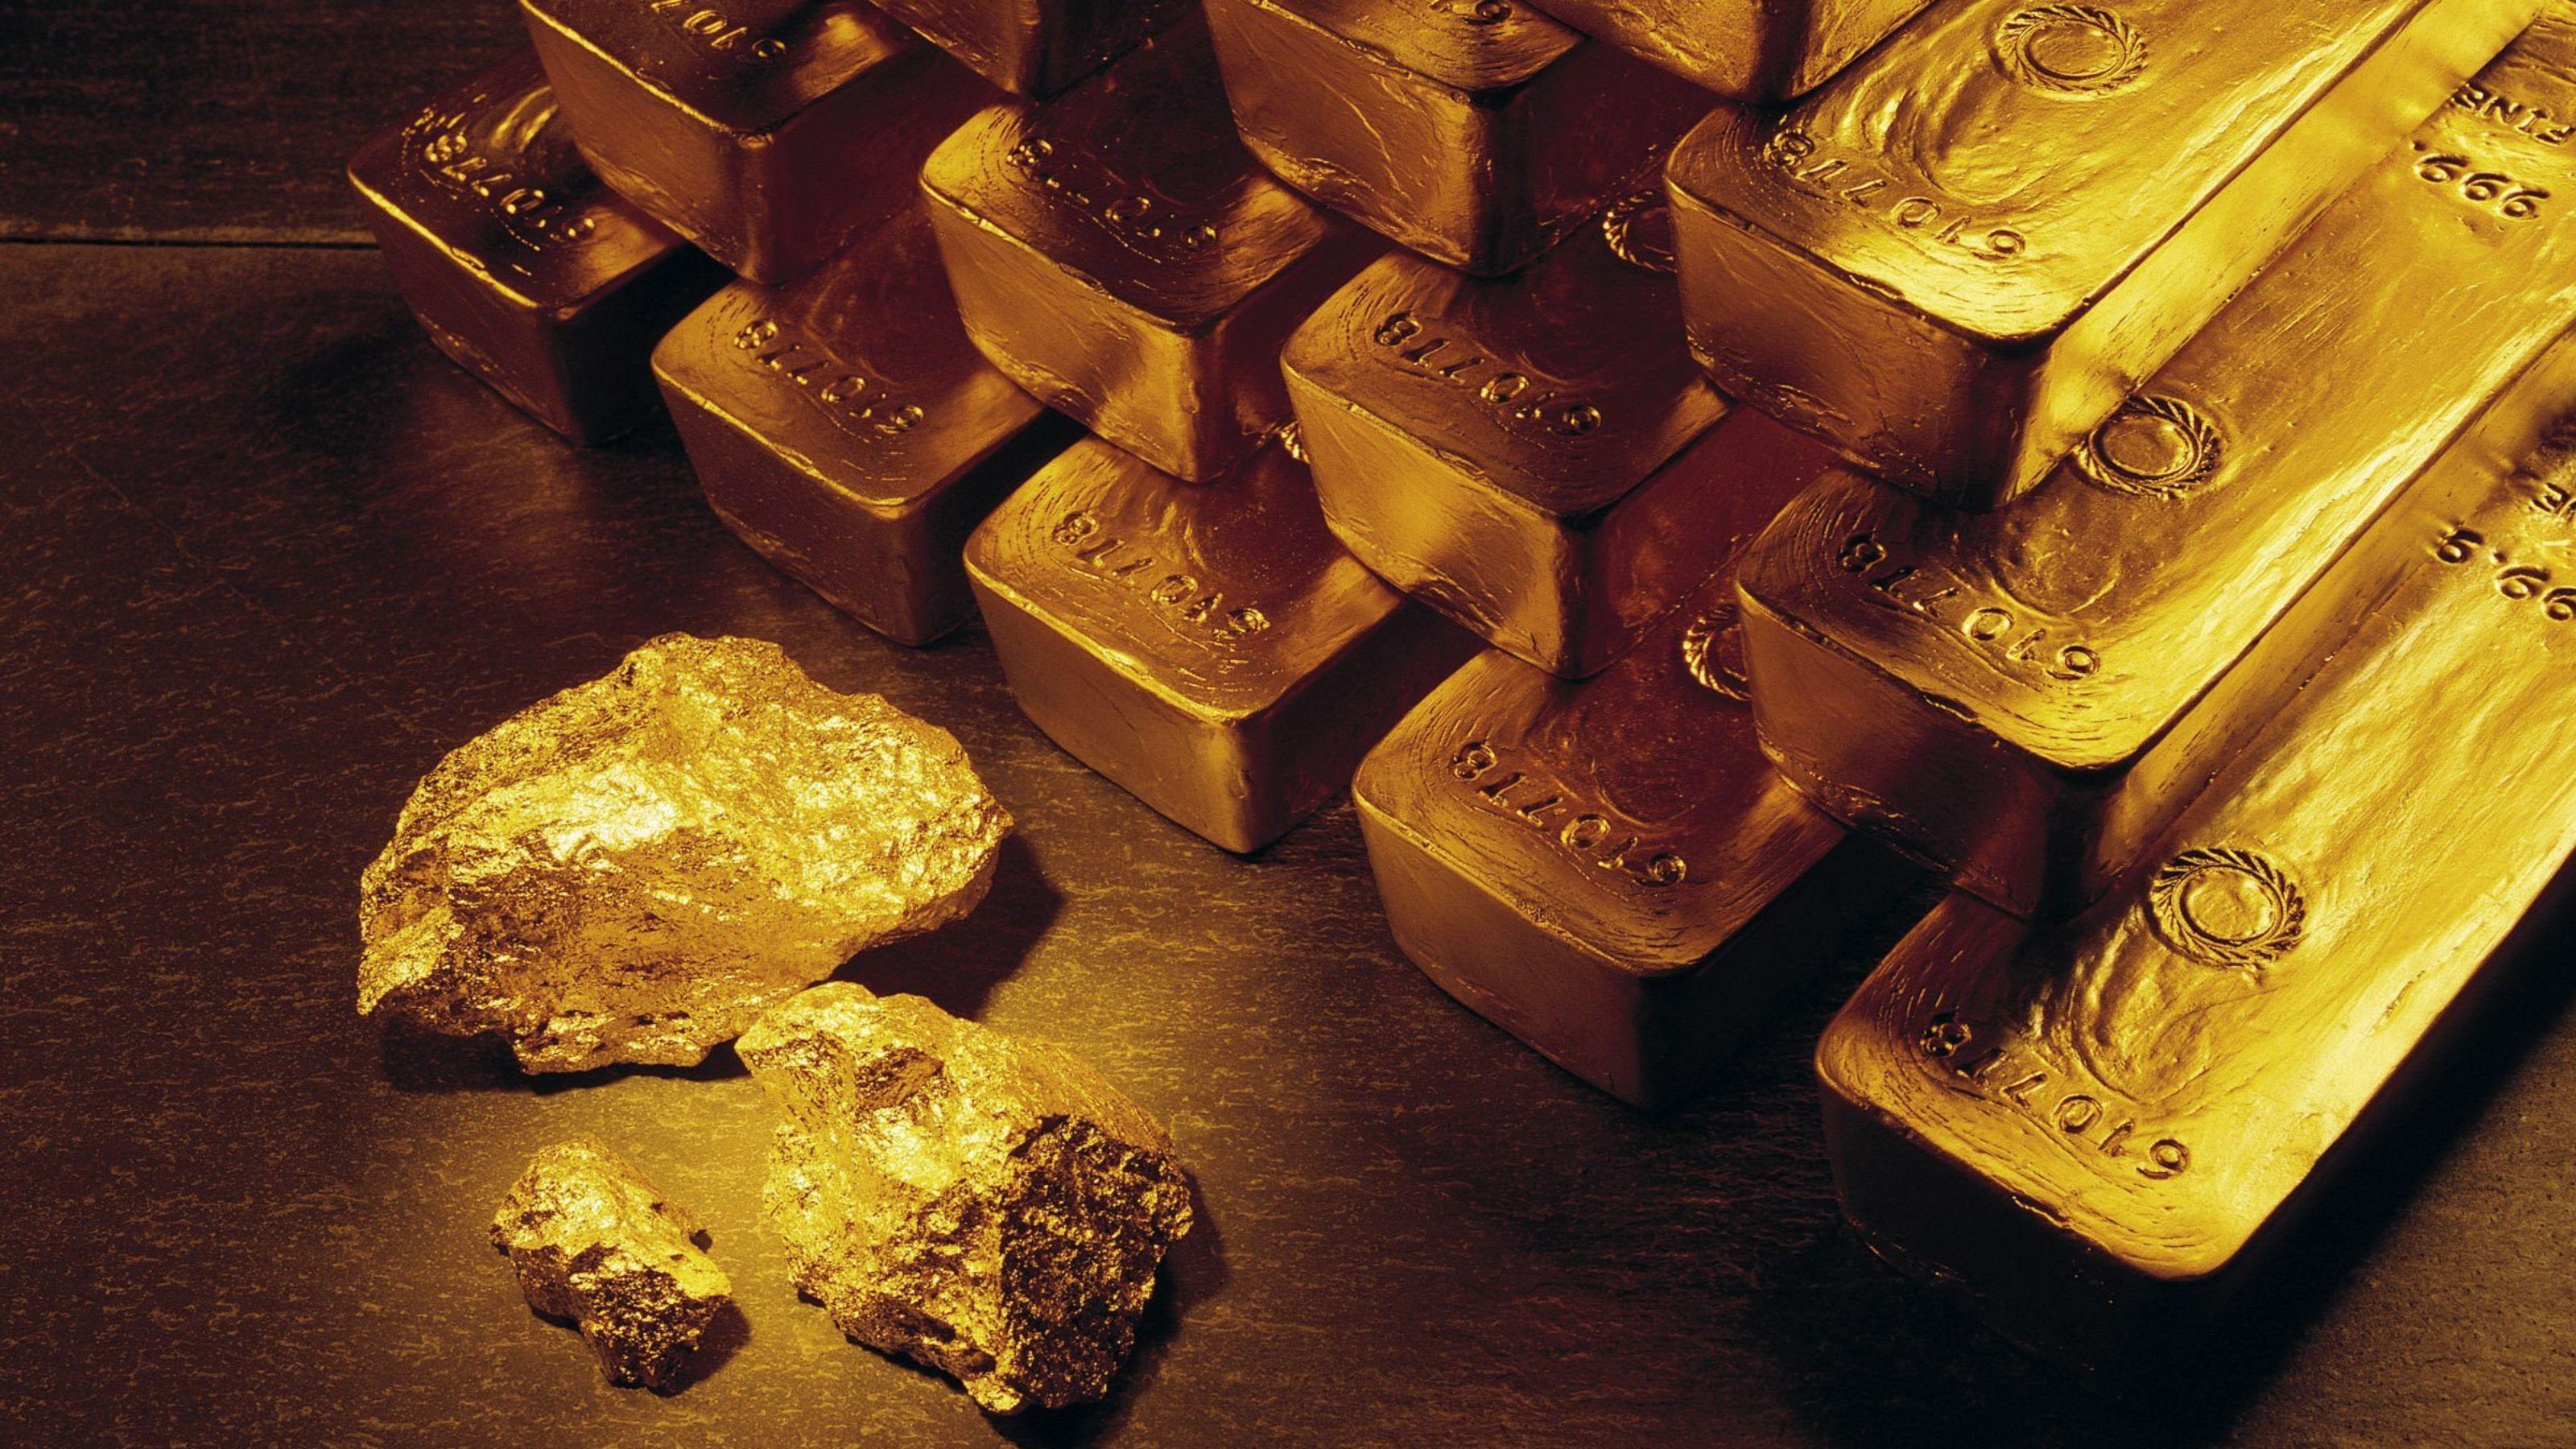 635608976381686345-AP-Gold-Record-NYBZ183